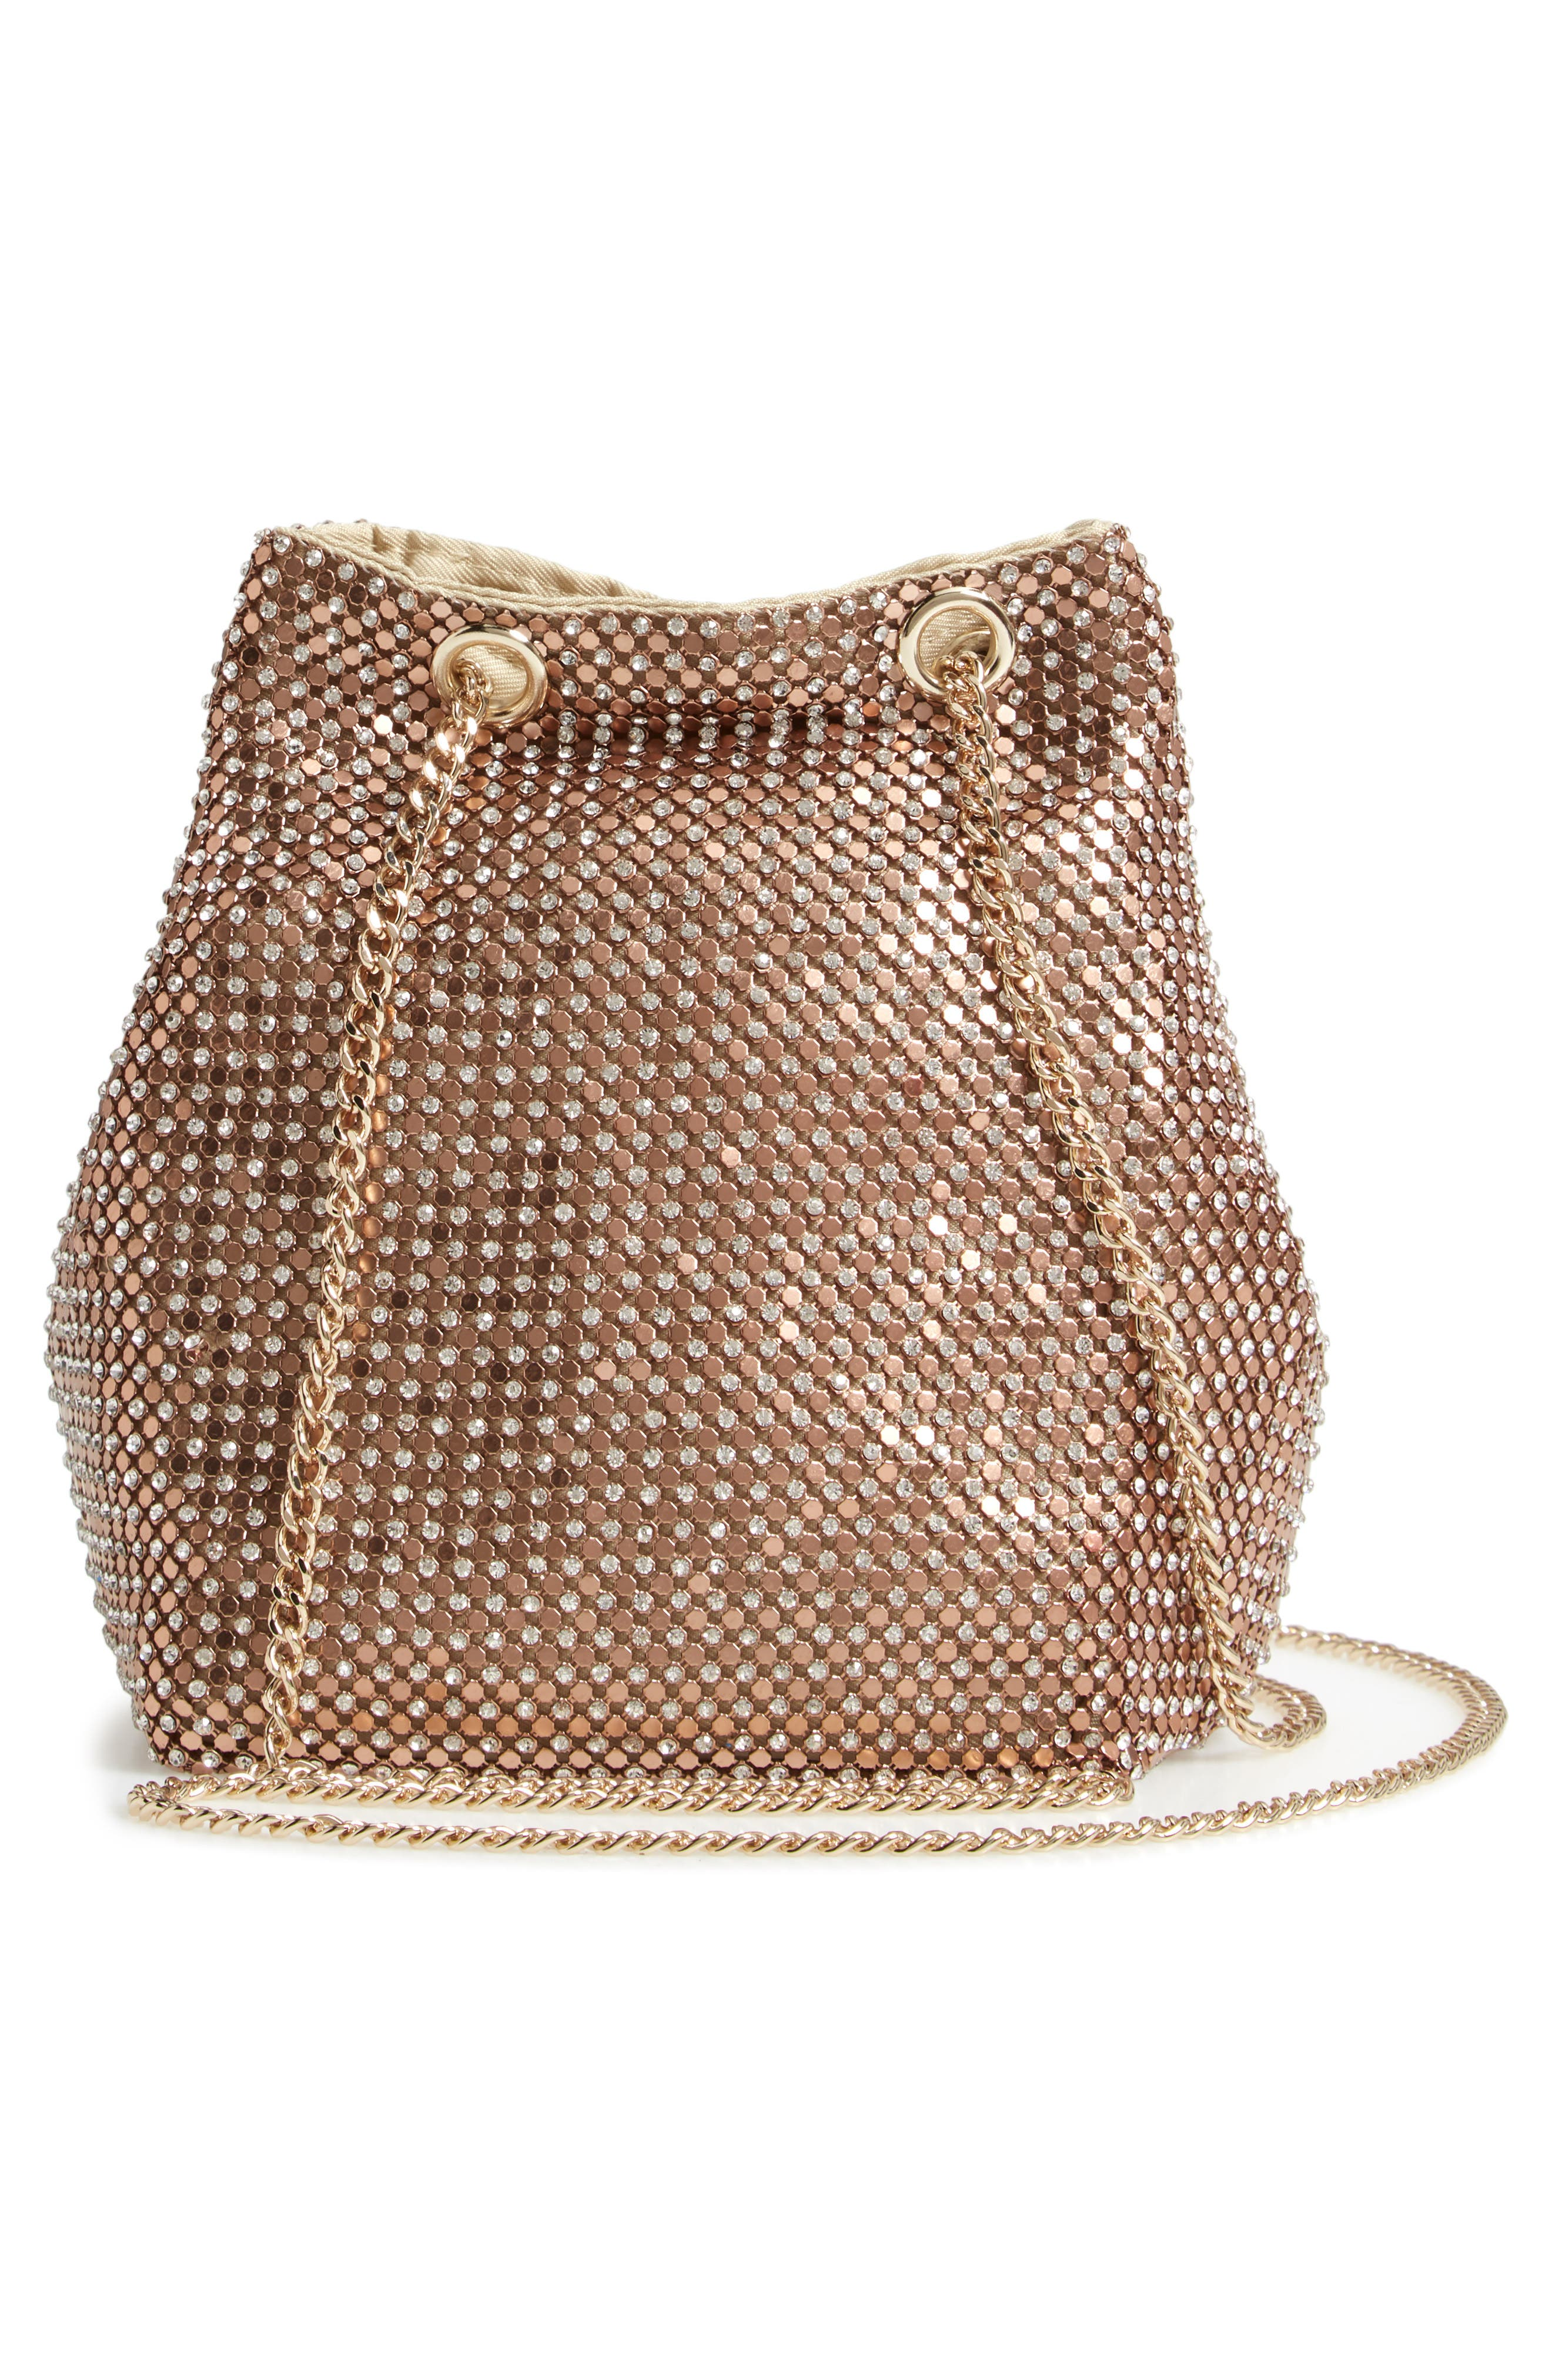 Crystal Mesh Crossbody Bucket Bag,                             Alternate thumbnail 3, color,                             ROSE GOLD